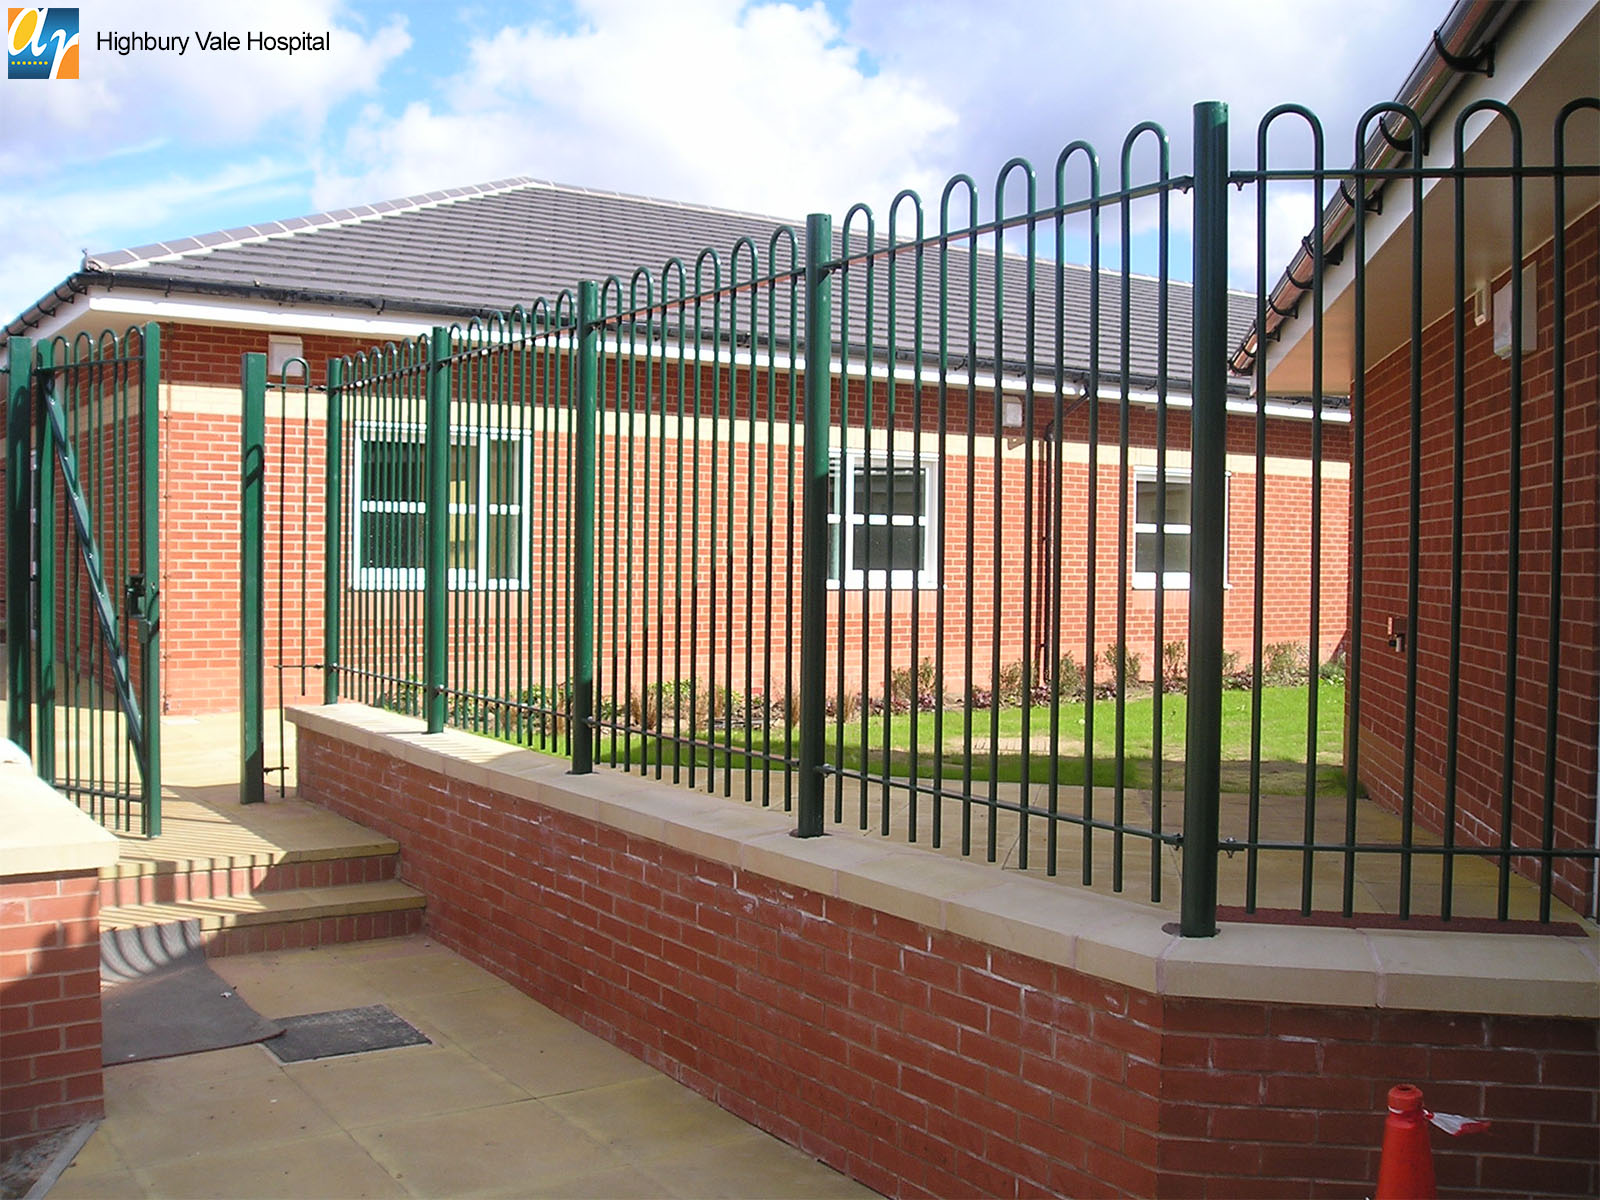 Highbury Vale Hospital standard bow top railings